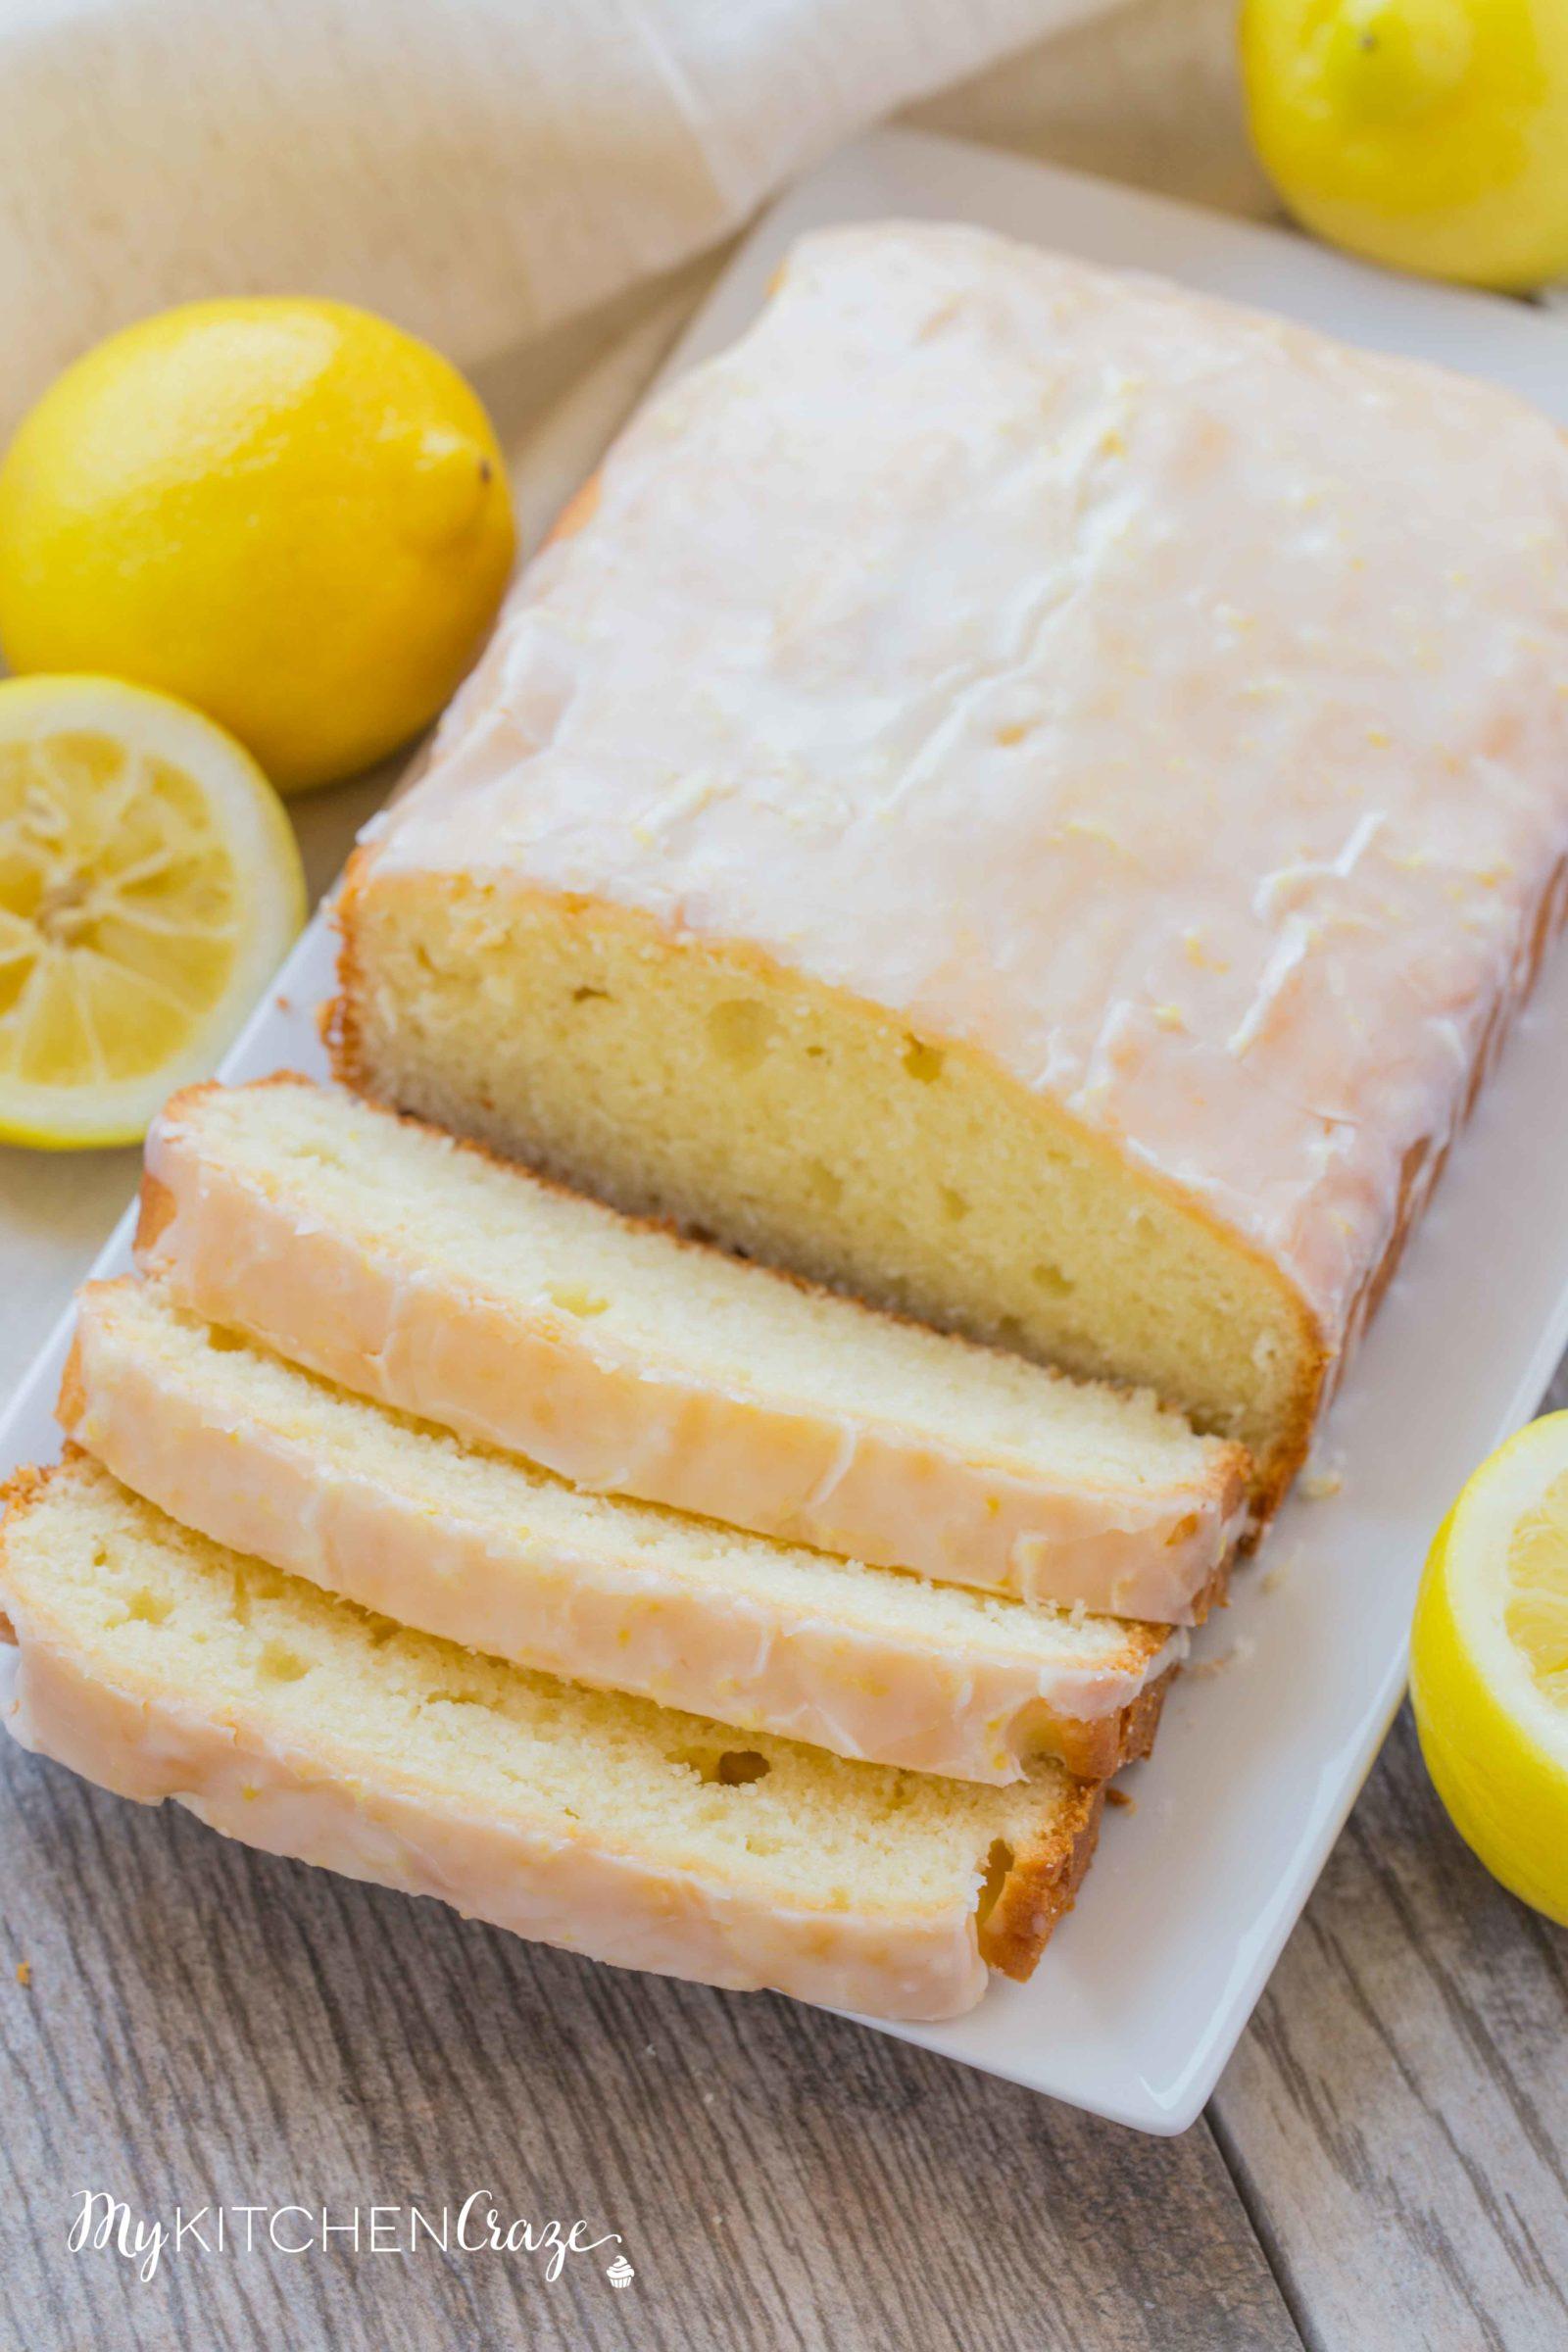 Lemon Yogurt Loaf Cake ~ mykitchencraze.com ~ Lemon yogurt cake is the perfect dessert for the whole family. It's moist and the lemon flavor is delicious.